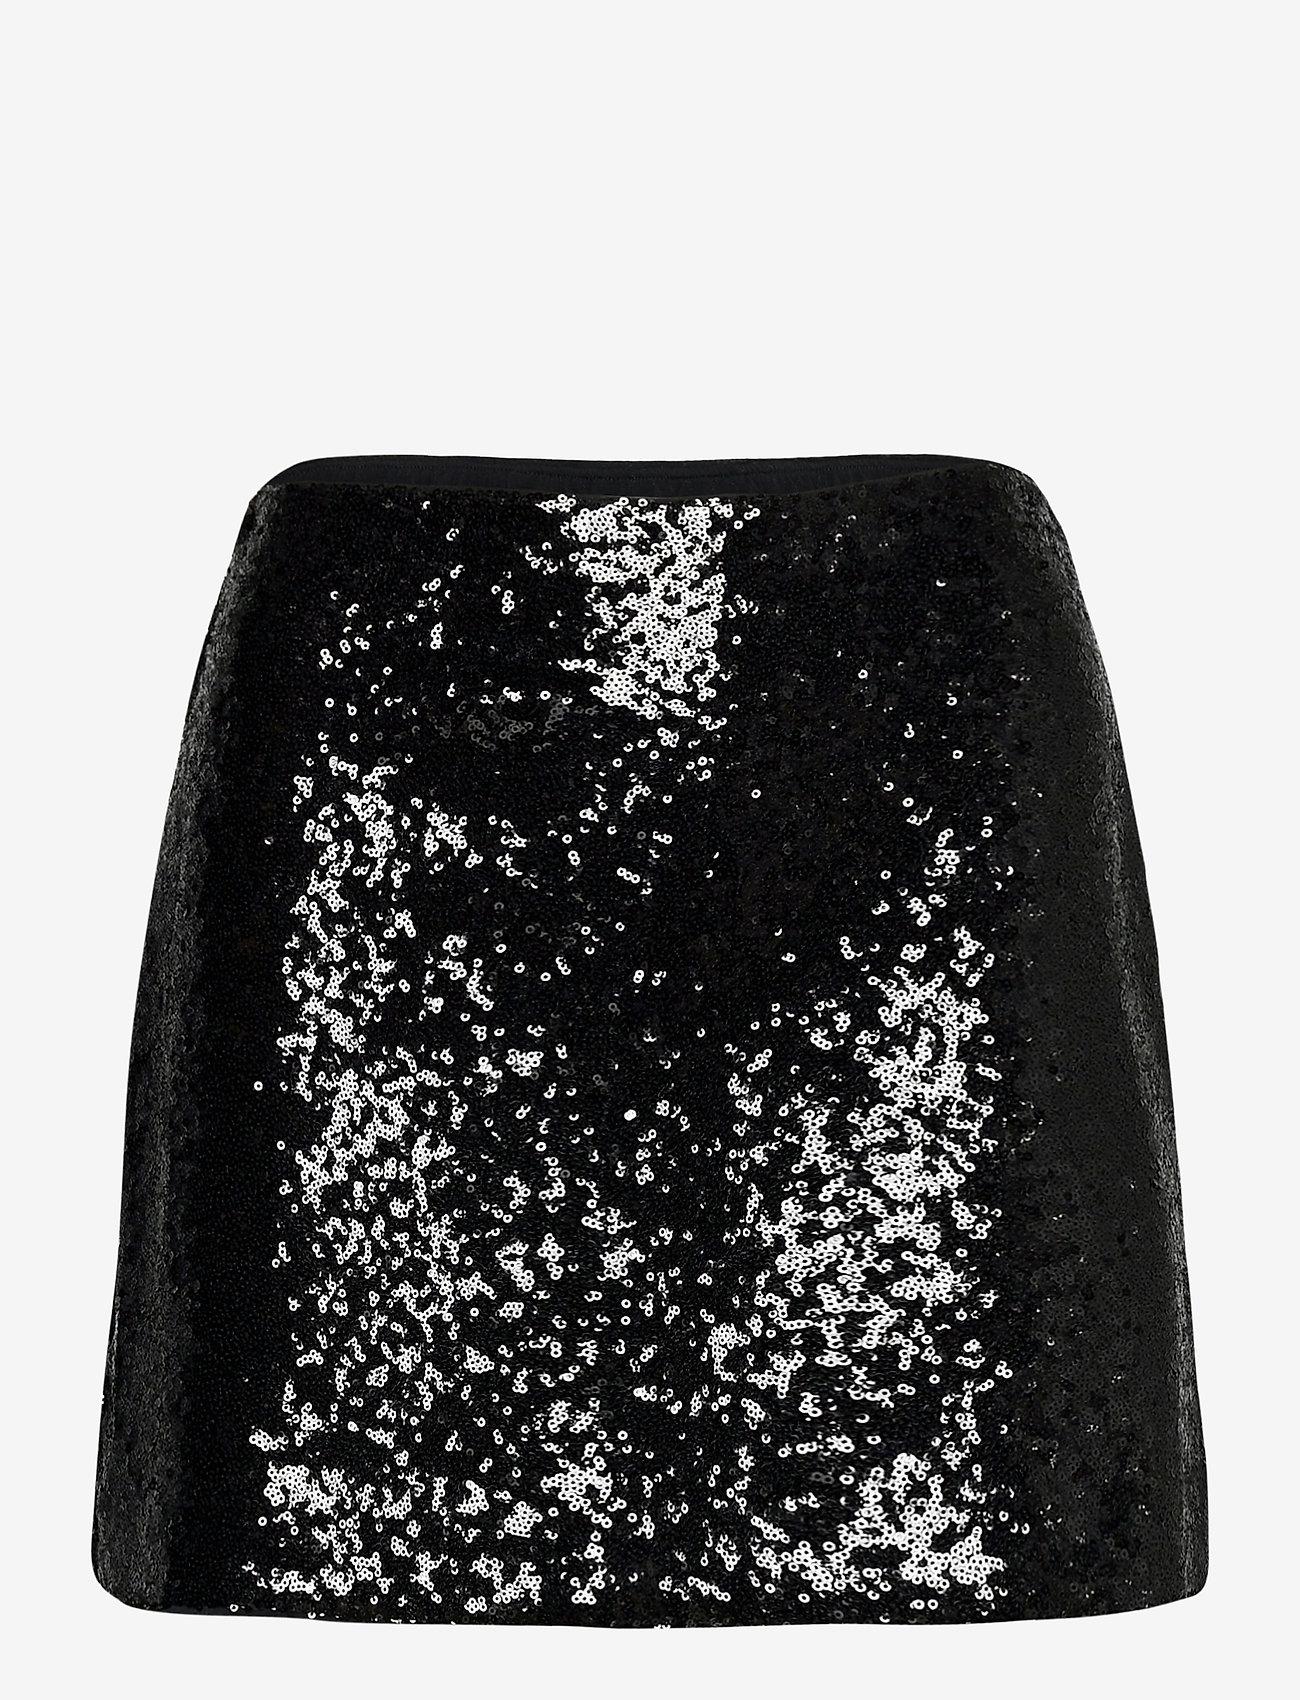 Abercrombie & Fitch - ANF WOMENS SKIRTS - korta kjolar - black dd - 0